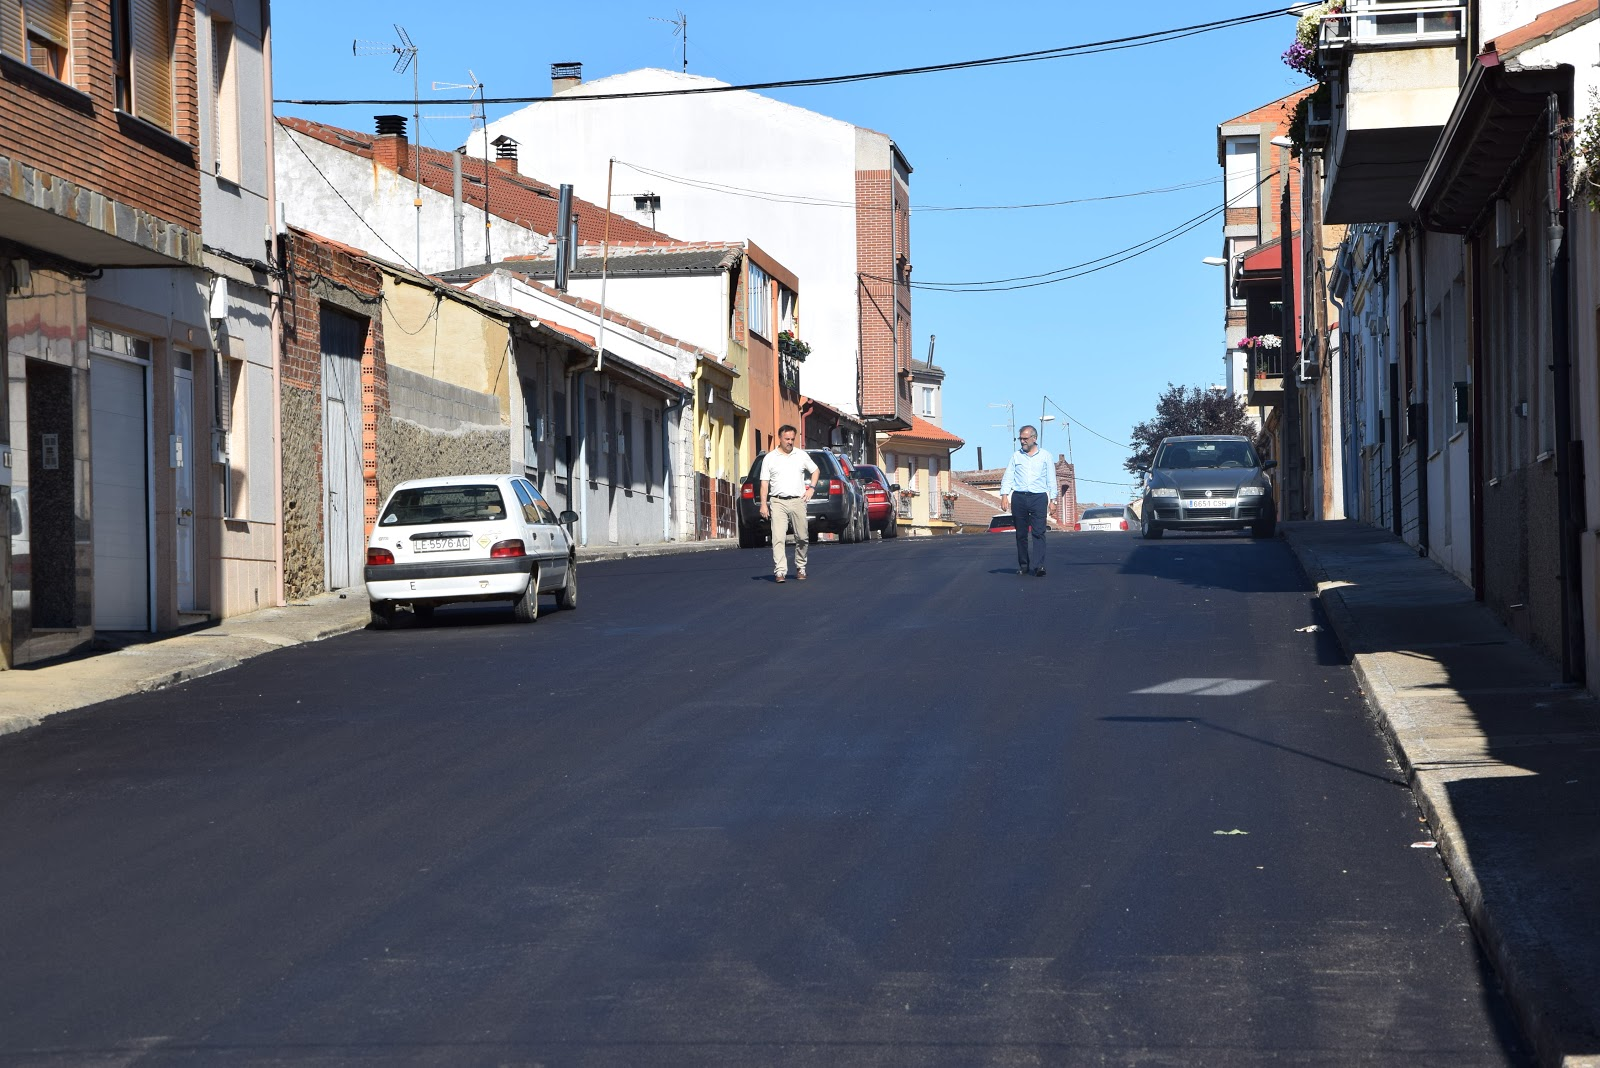 Circuito Urbano La Bañeza : La bañeza hoy plan de asfaltado en la bañeza